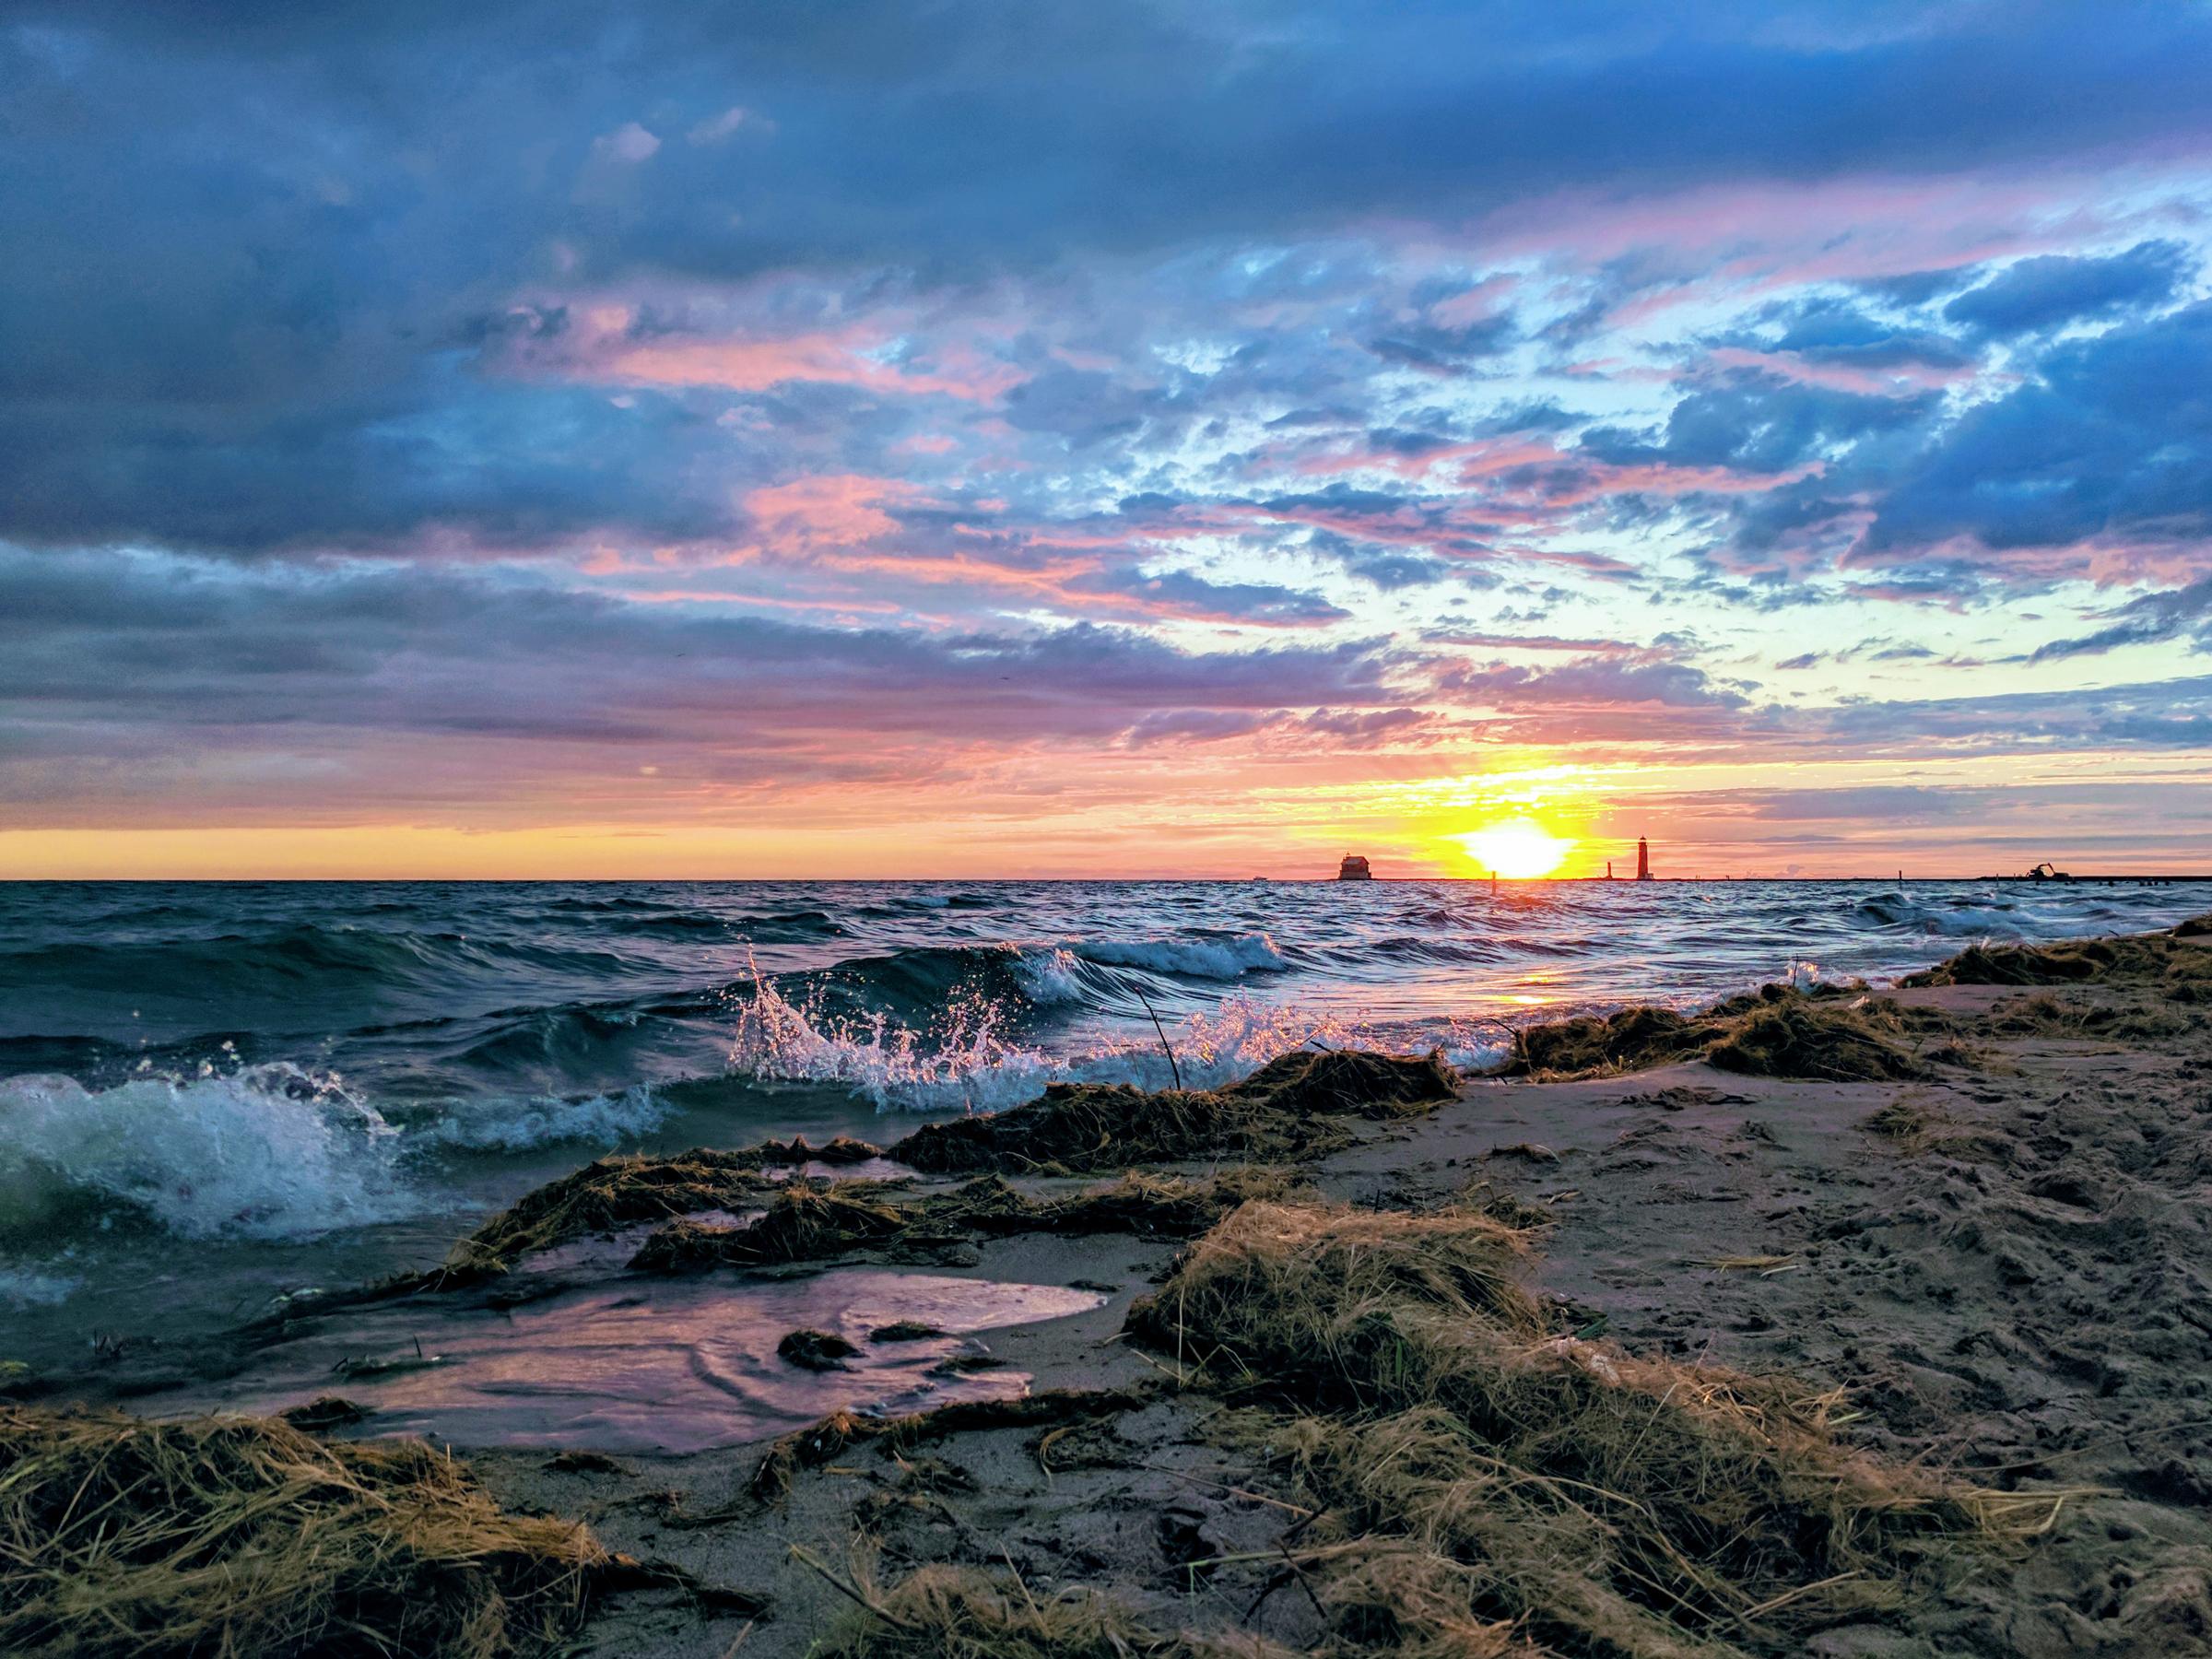 West Michigan Tourist Association 2017 Photo Contest Winner. Photo by Nathan Logsdon.